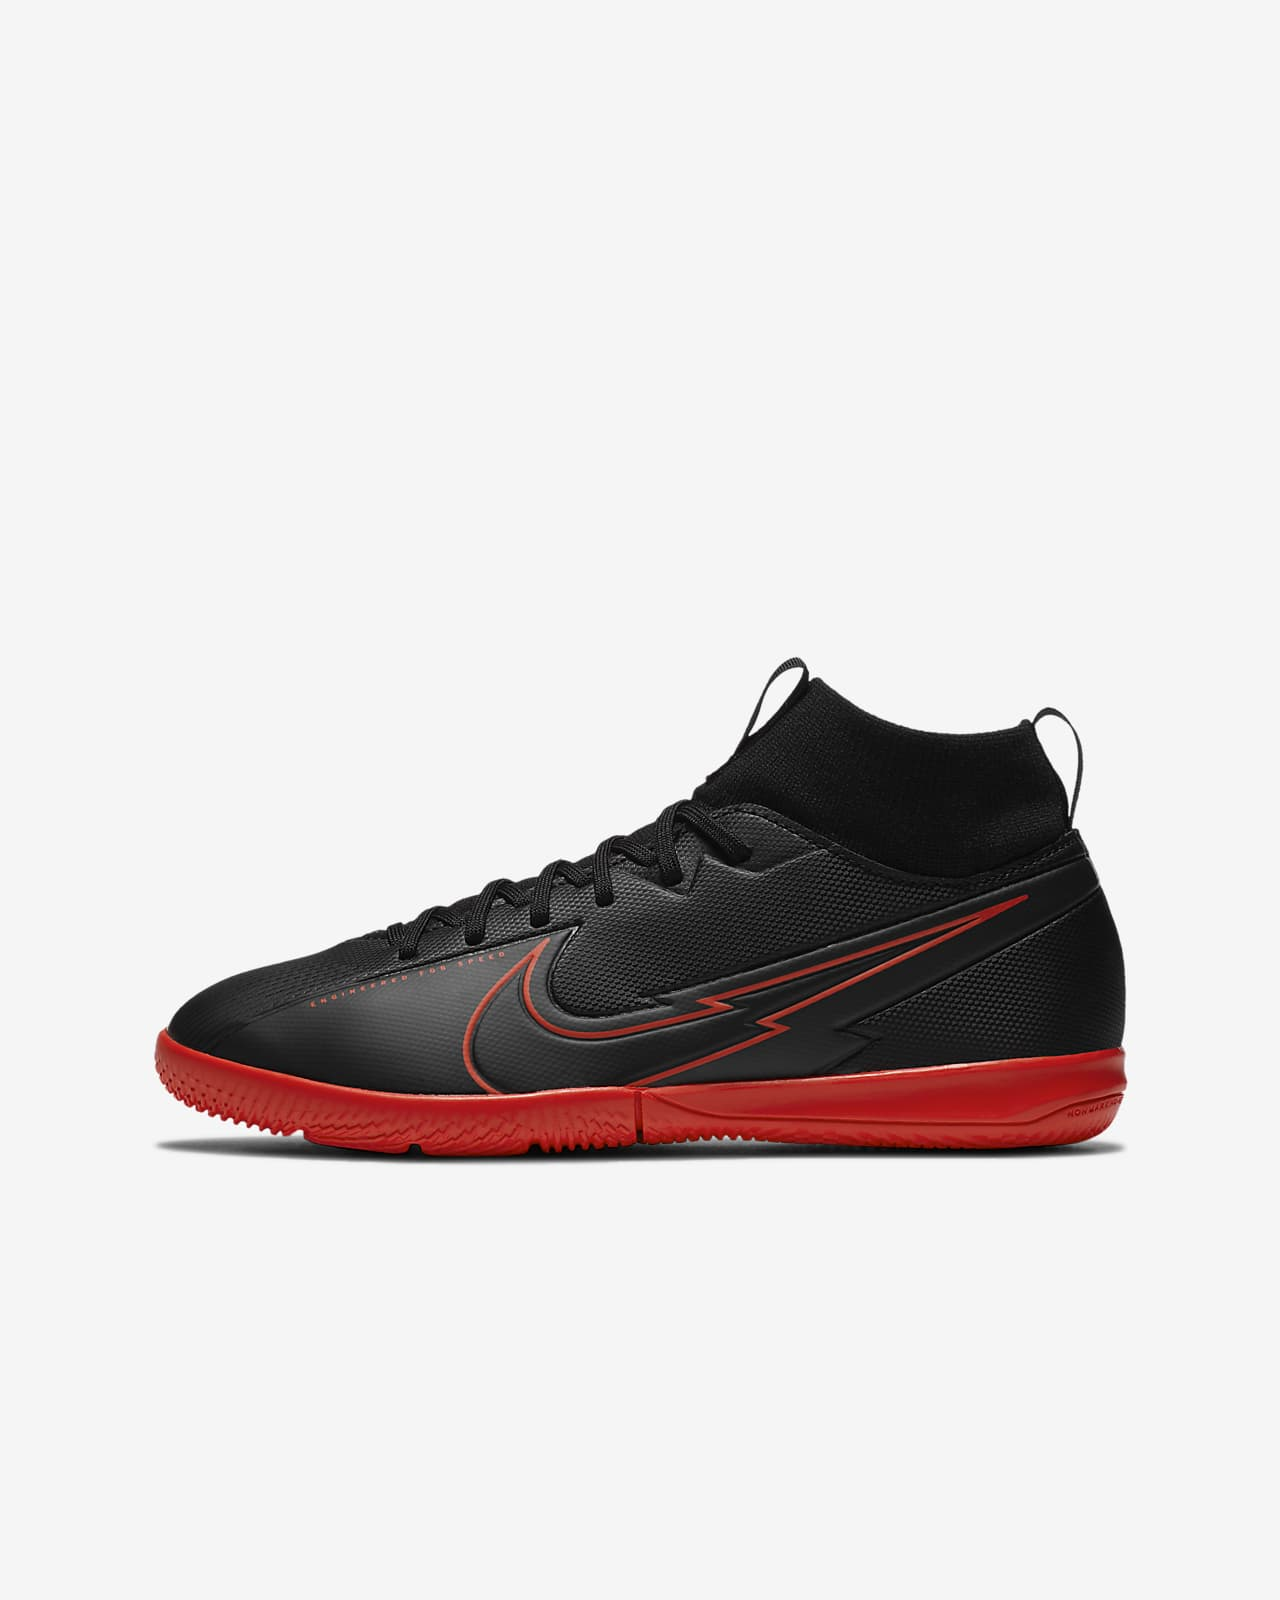 Chaussure de football en salle Nike Mercurial Superfly 7